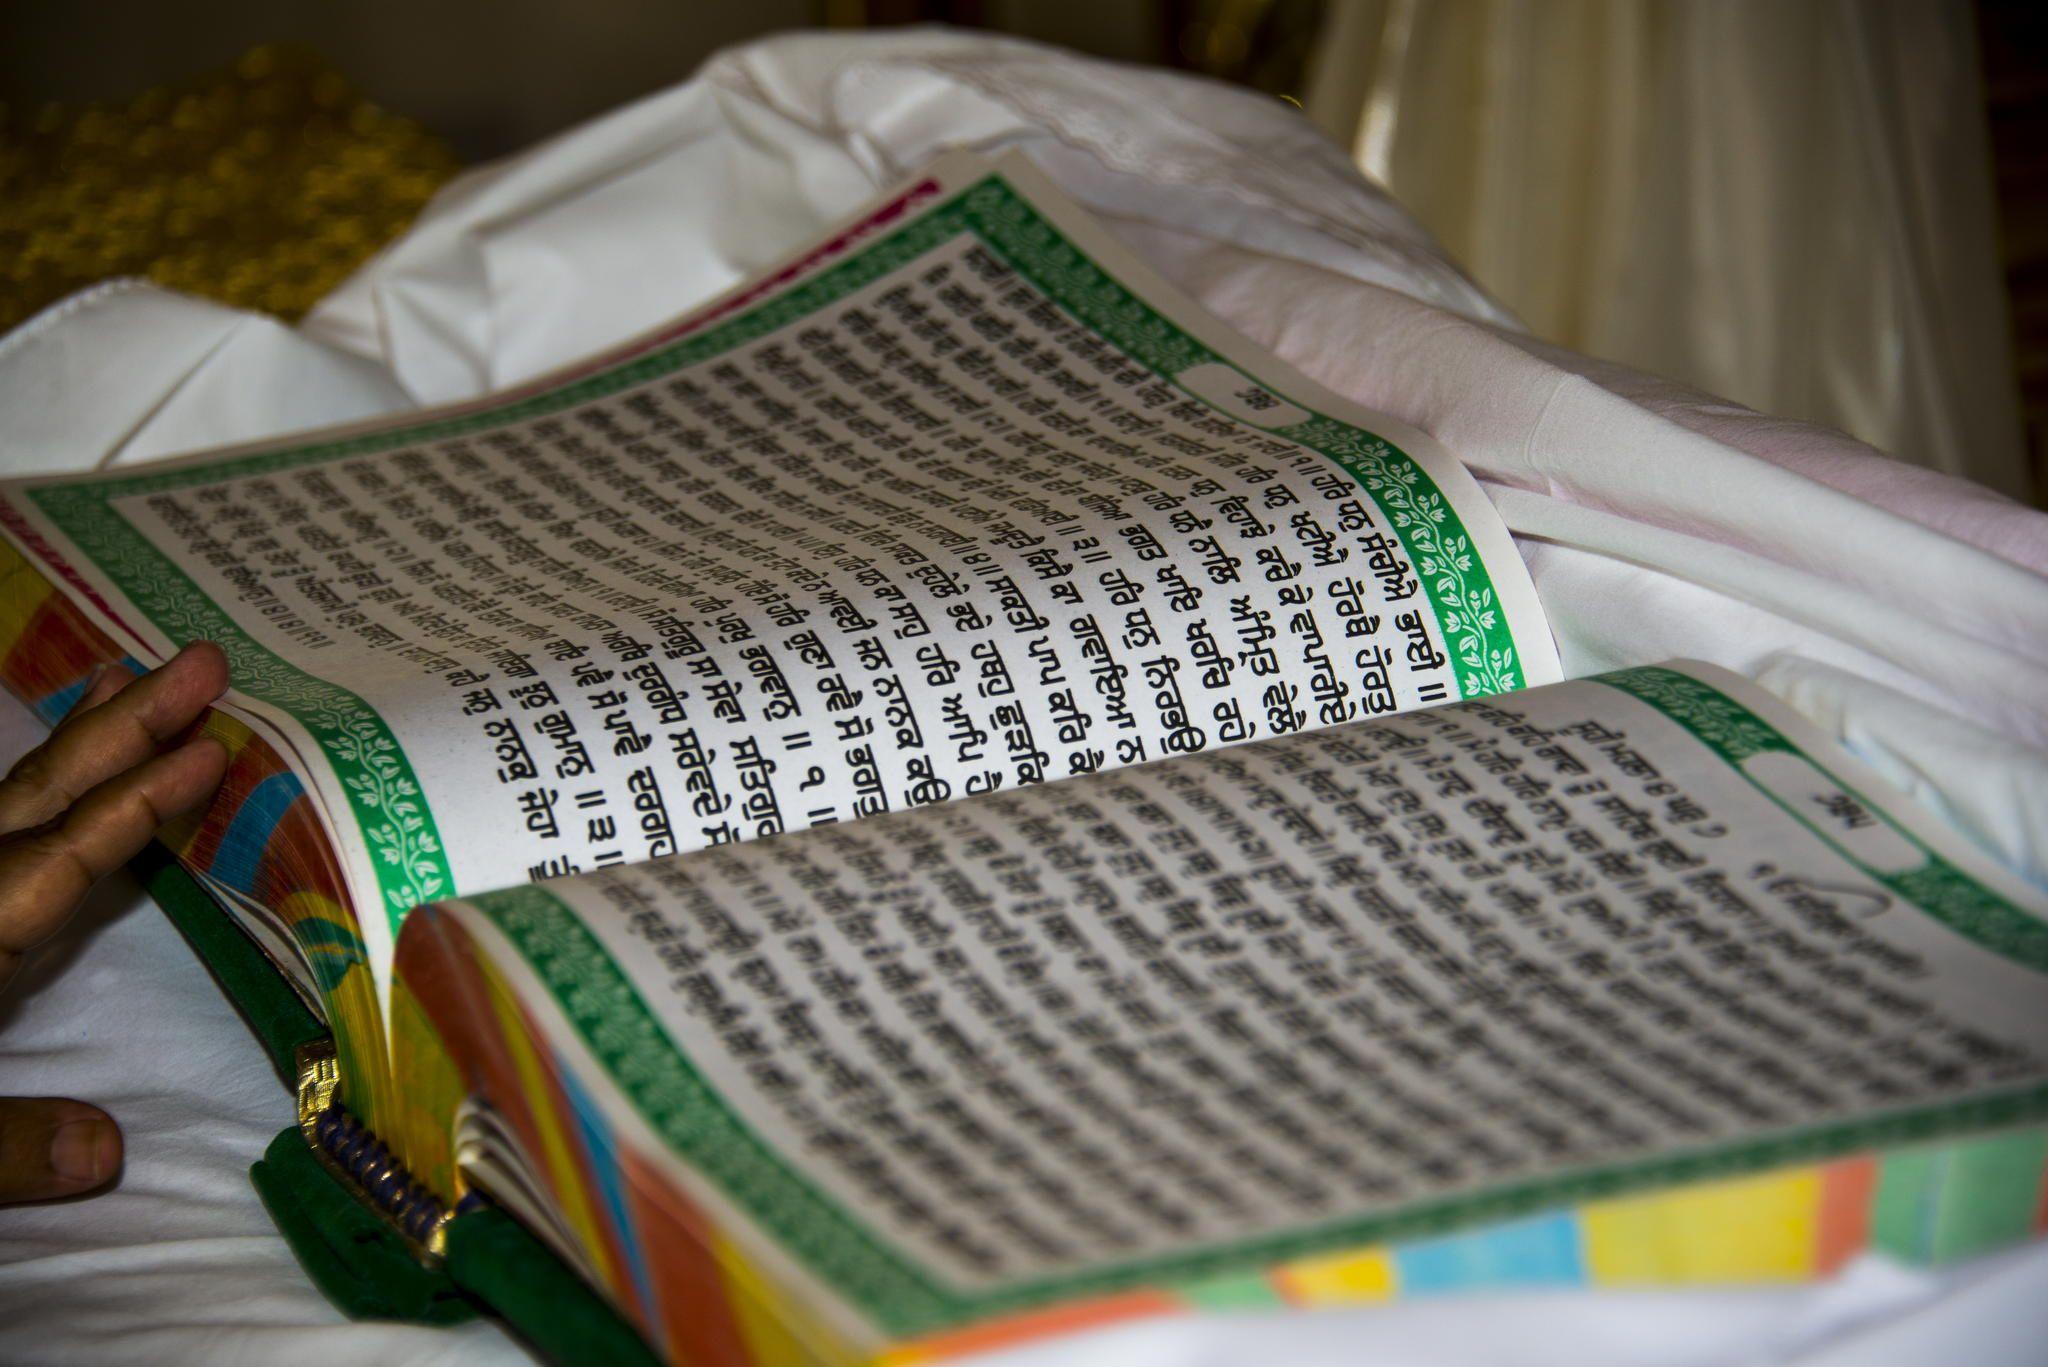 Guru granth sahib guru granth sahib the holy scripture